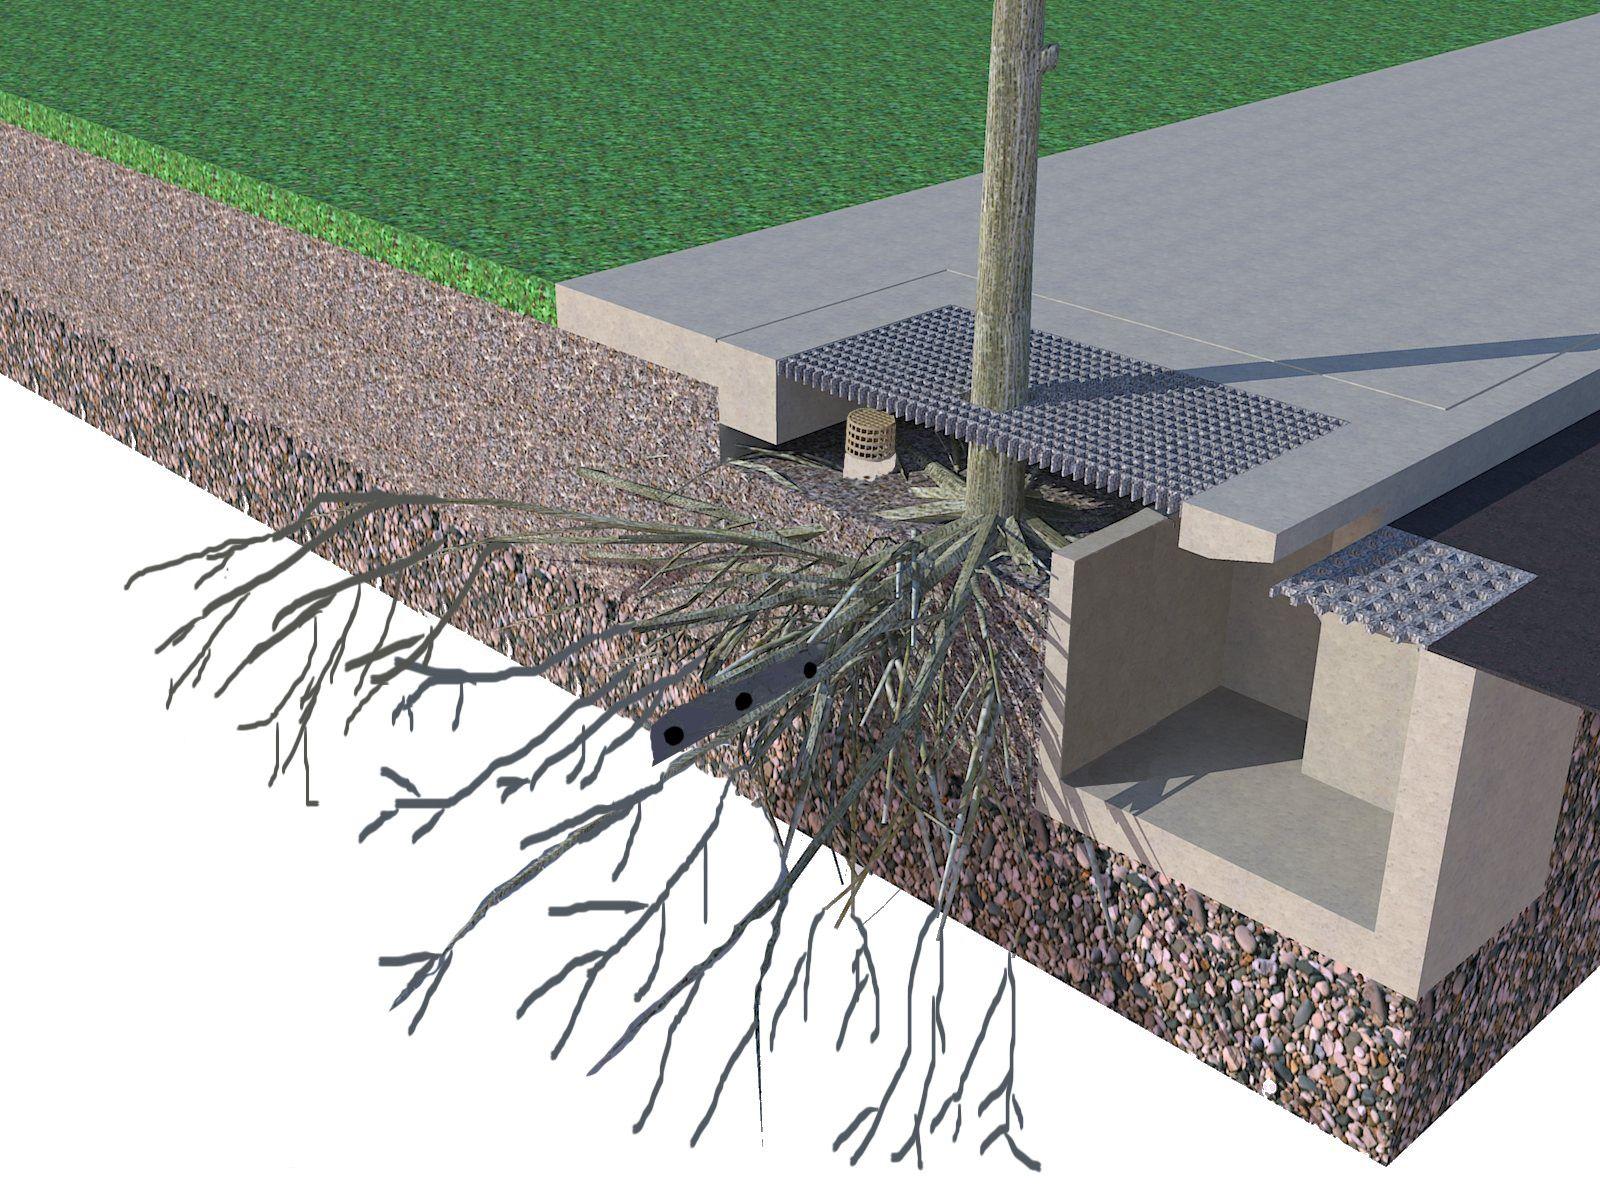 Stormtree - Tree box filter bioretention stormwater